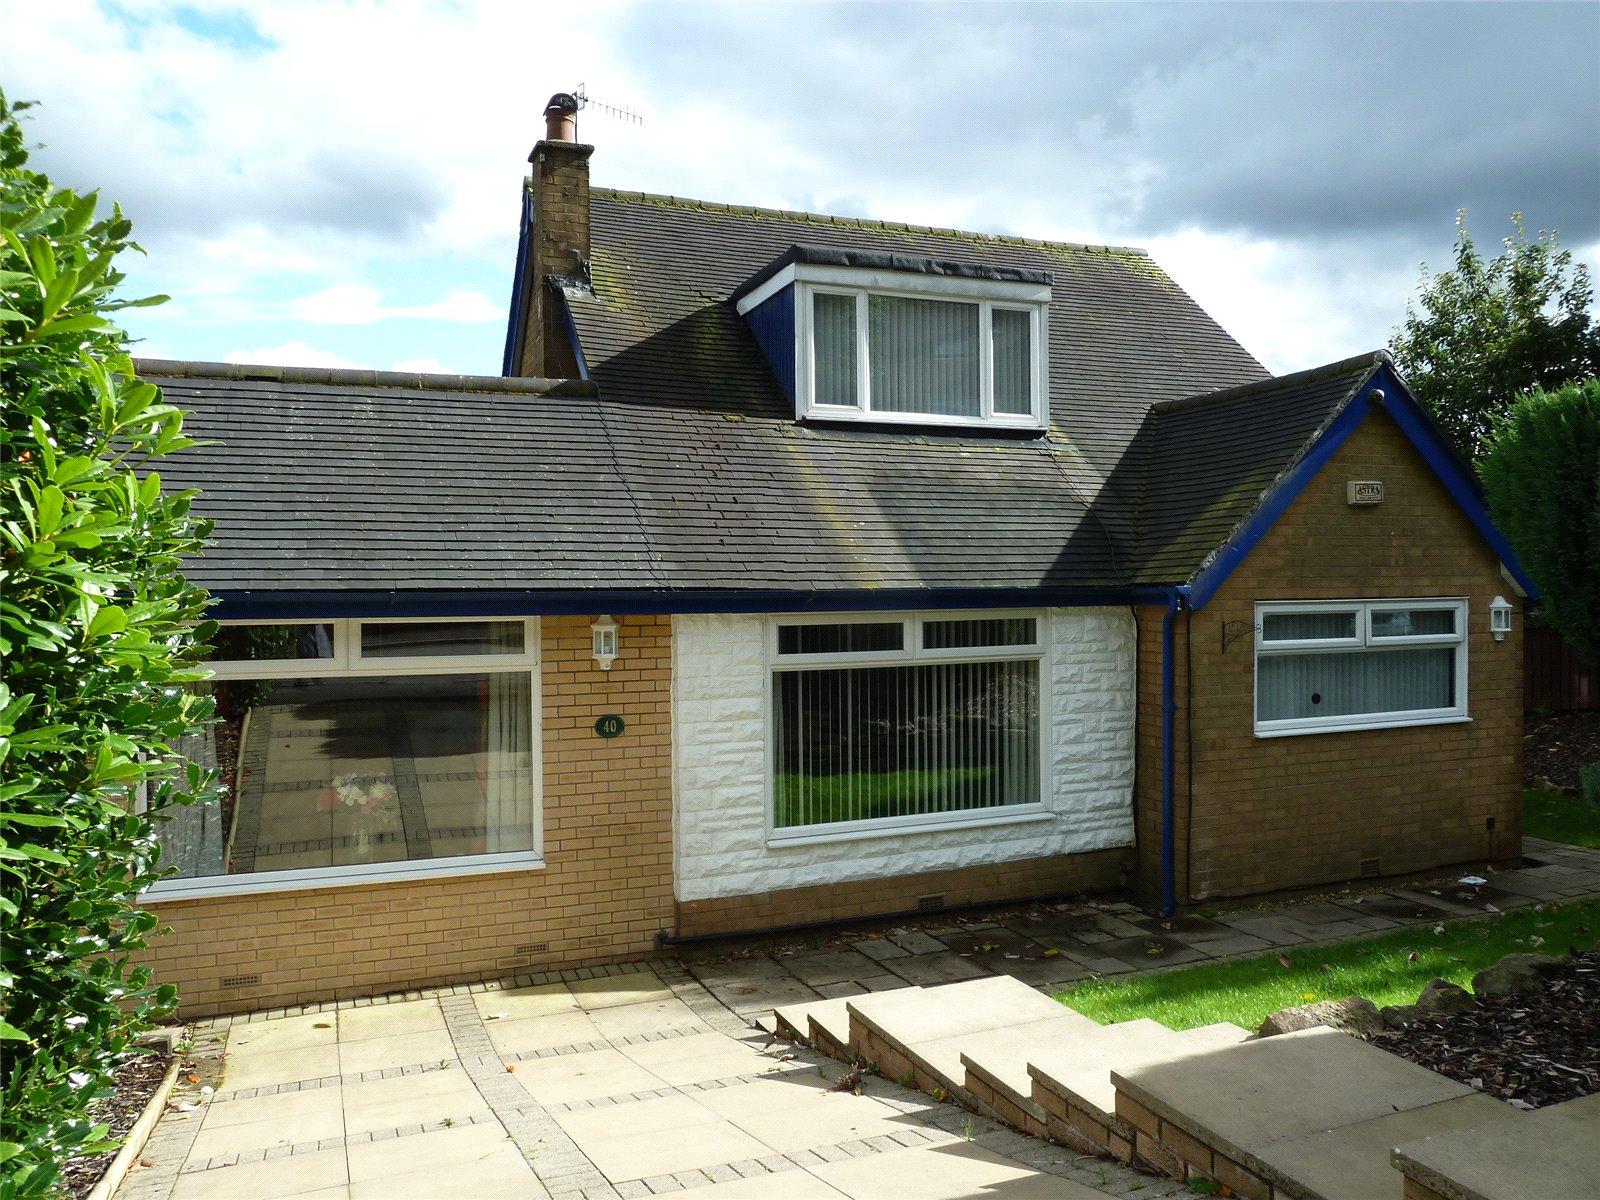 4 Bedrooms Detached House for sale in Sunfield Lane, Diggle, Saddleworth, OL3